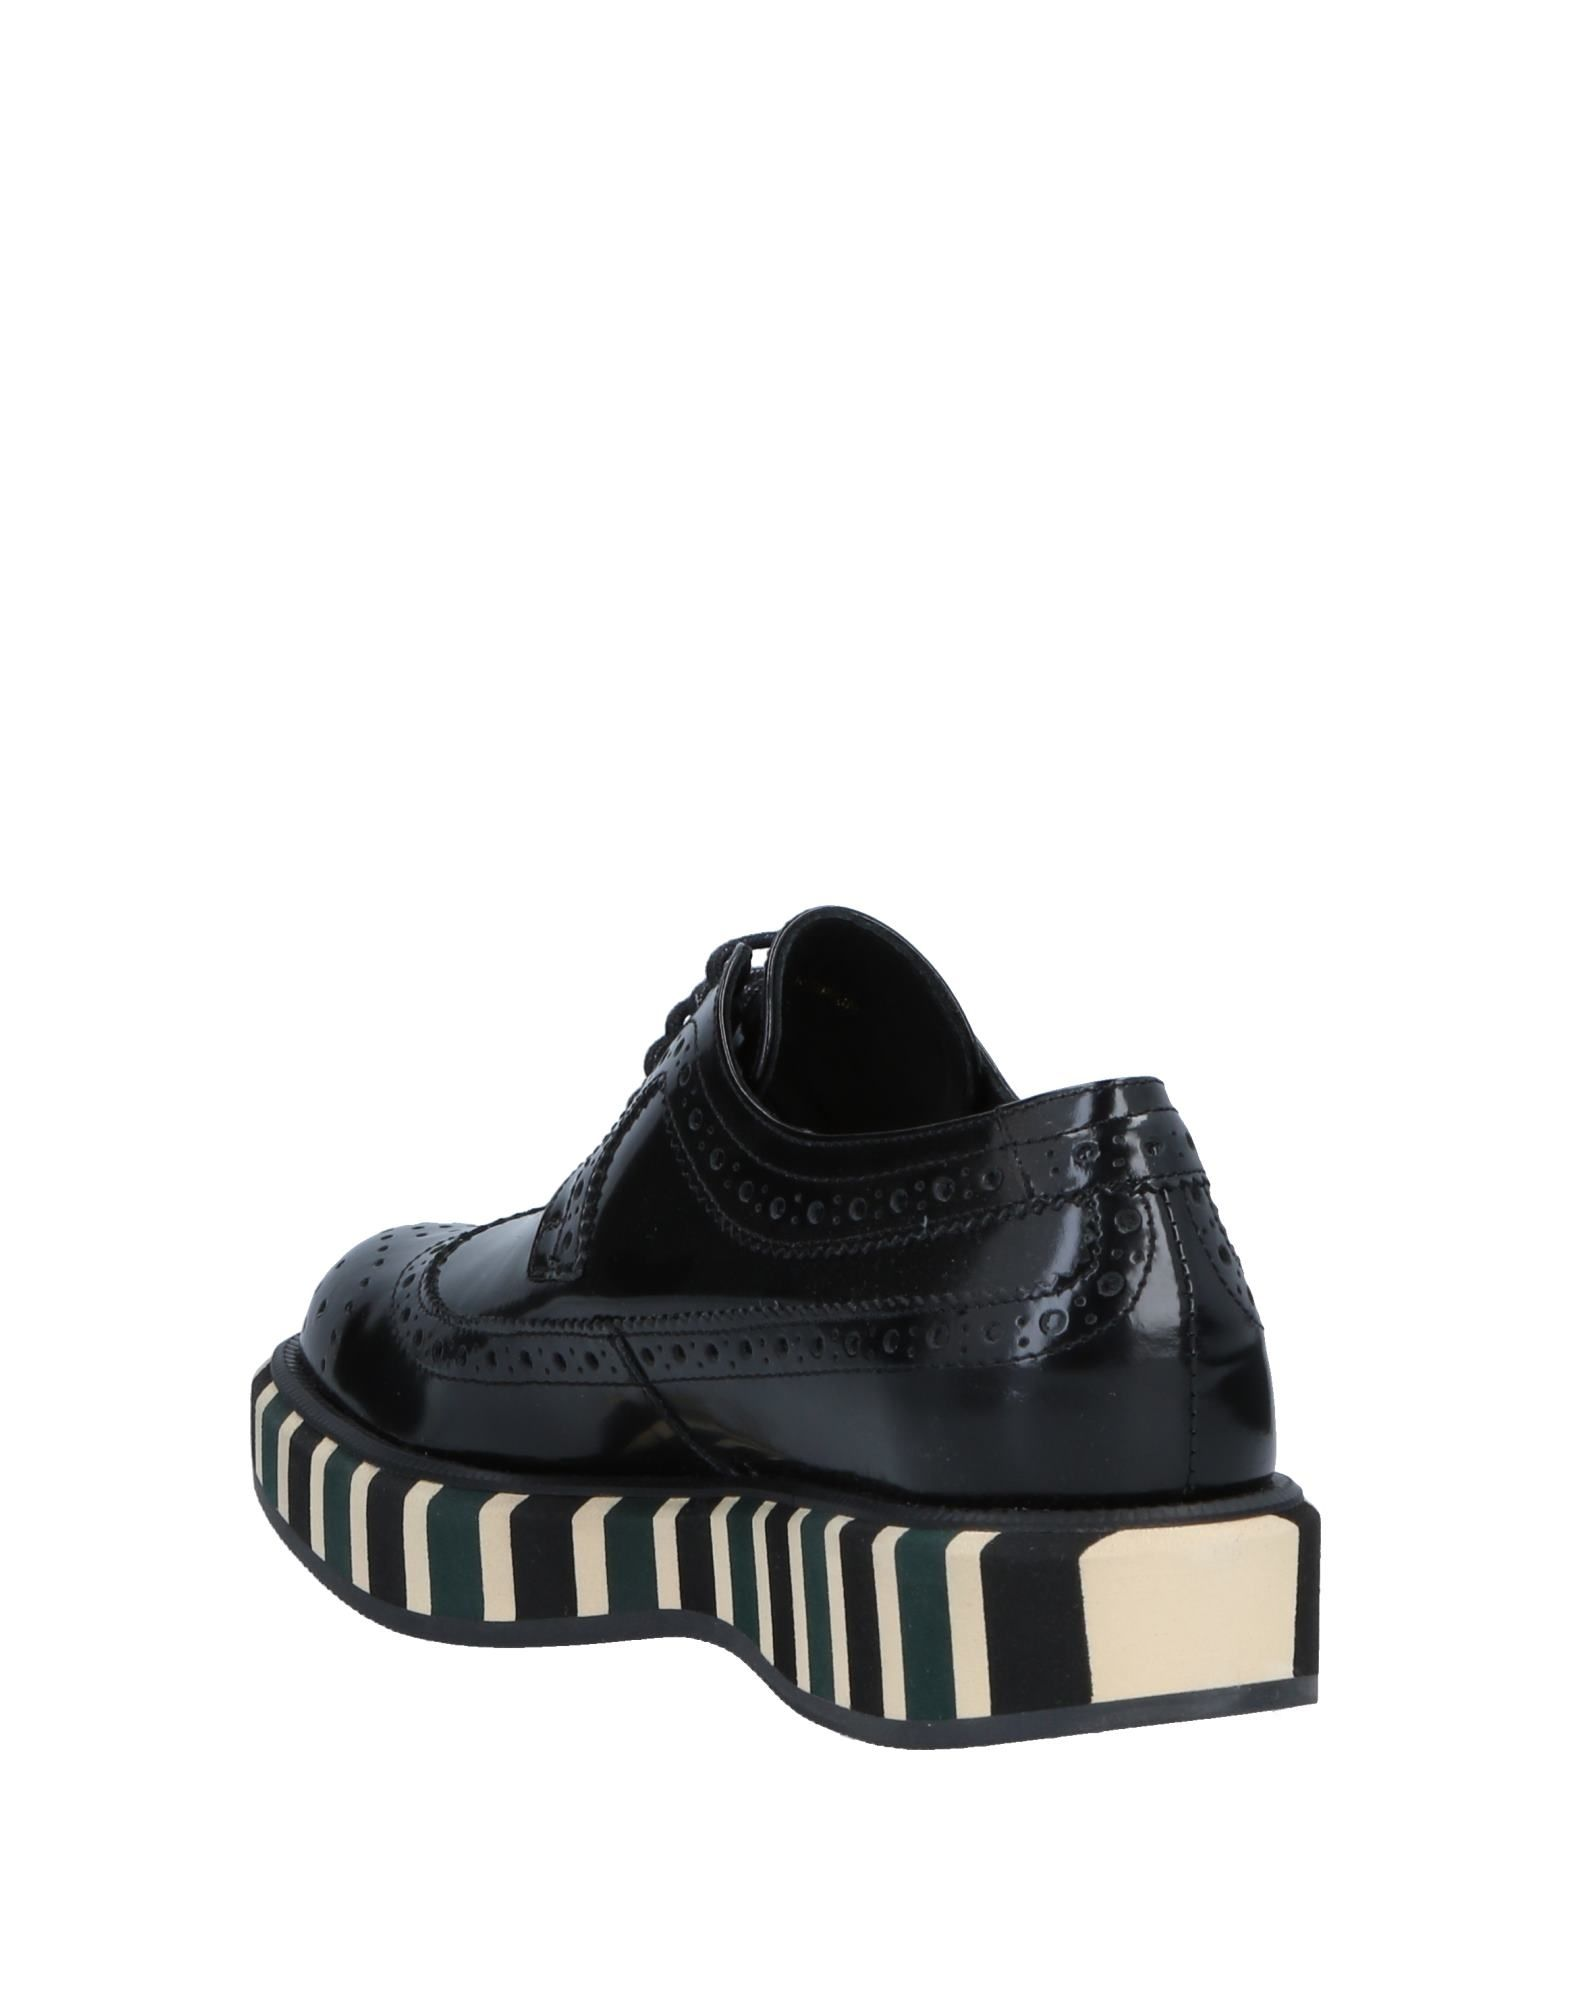 Stilvolle billige Schuhe Paloma  Barceló Schnürschuhe Damen  Paloma 11516815RL 3d6fd4